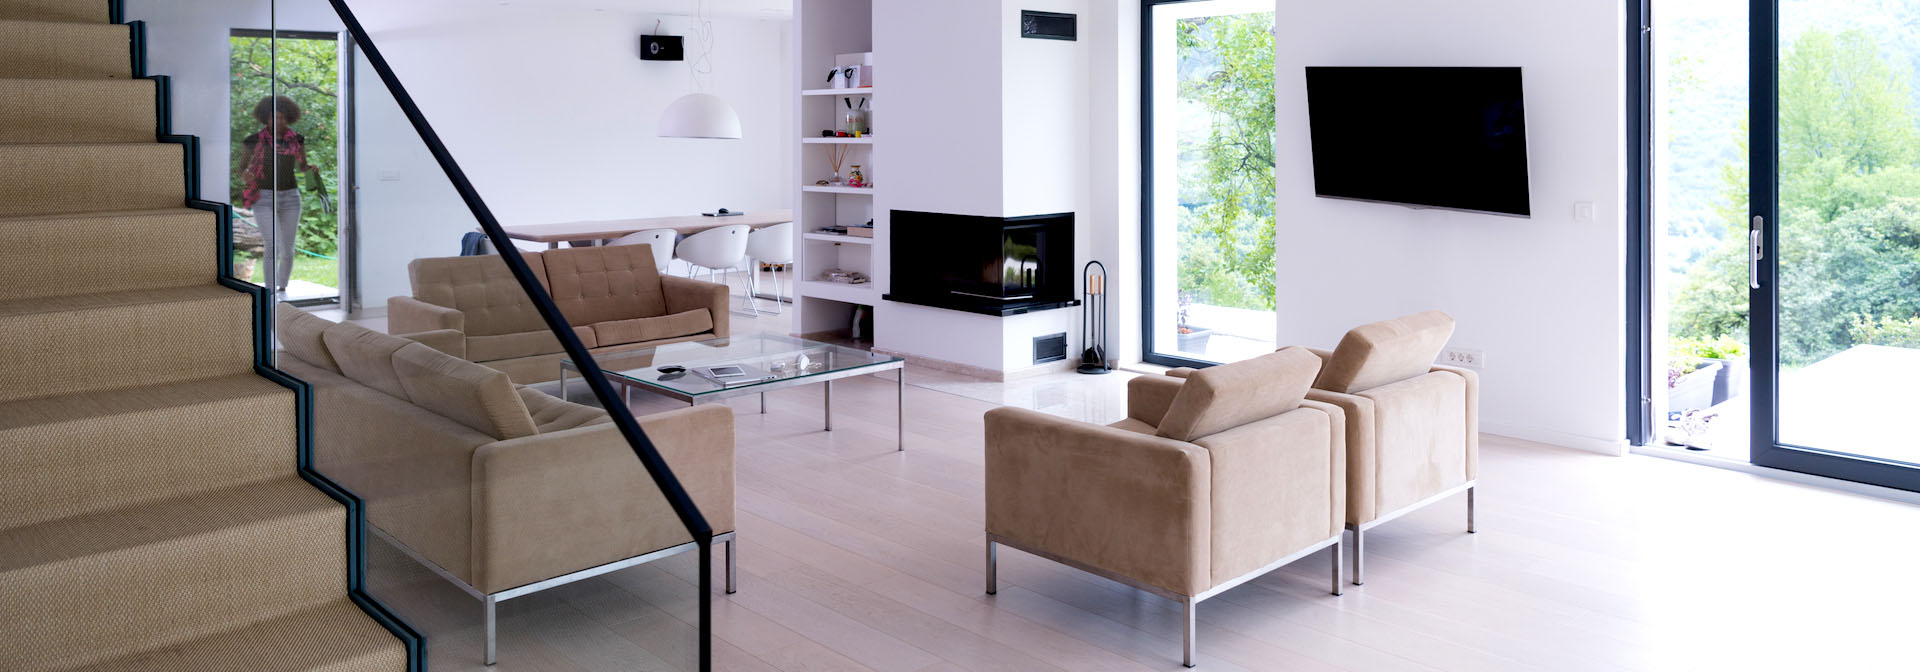 CCI Real Estate Premium